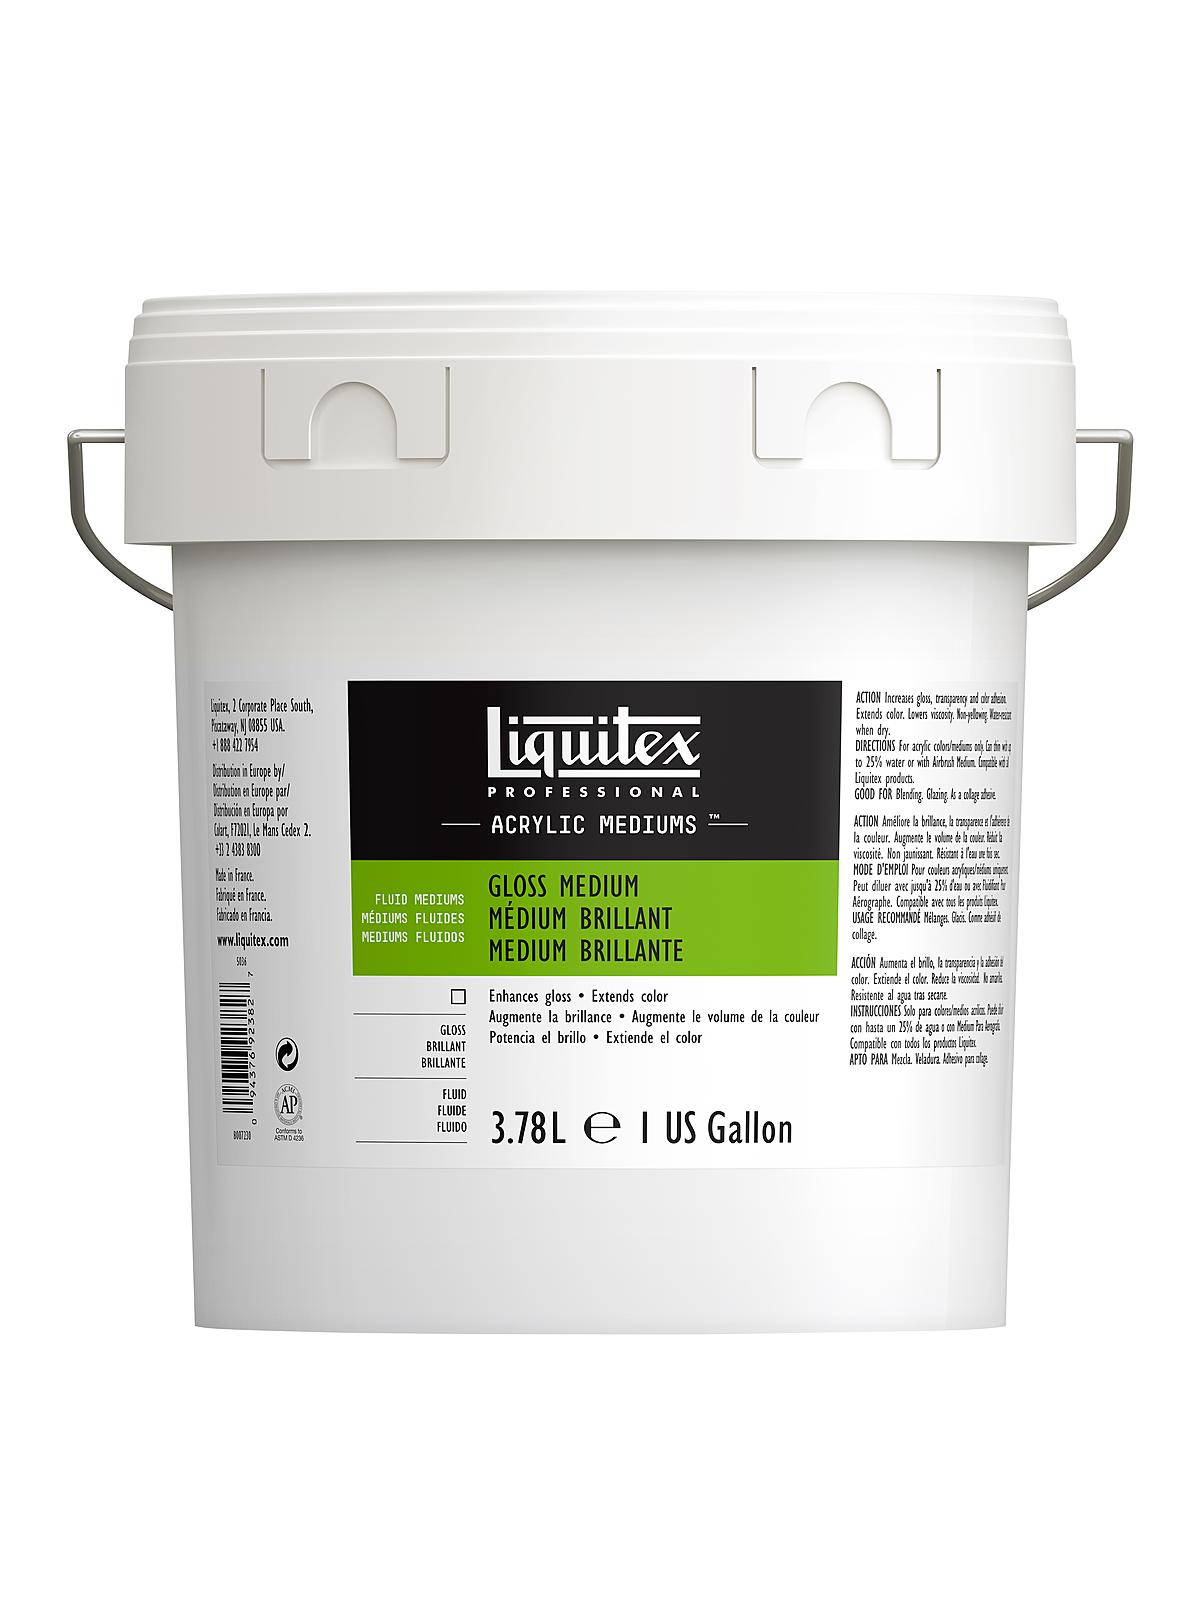 Liquitex acrylic gloss medium varnish ebay for Gloss medium for acrylic painting